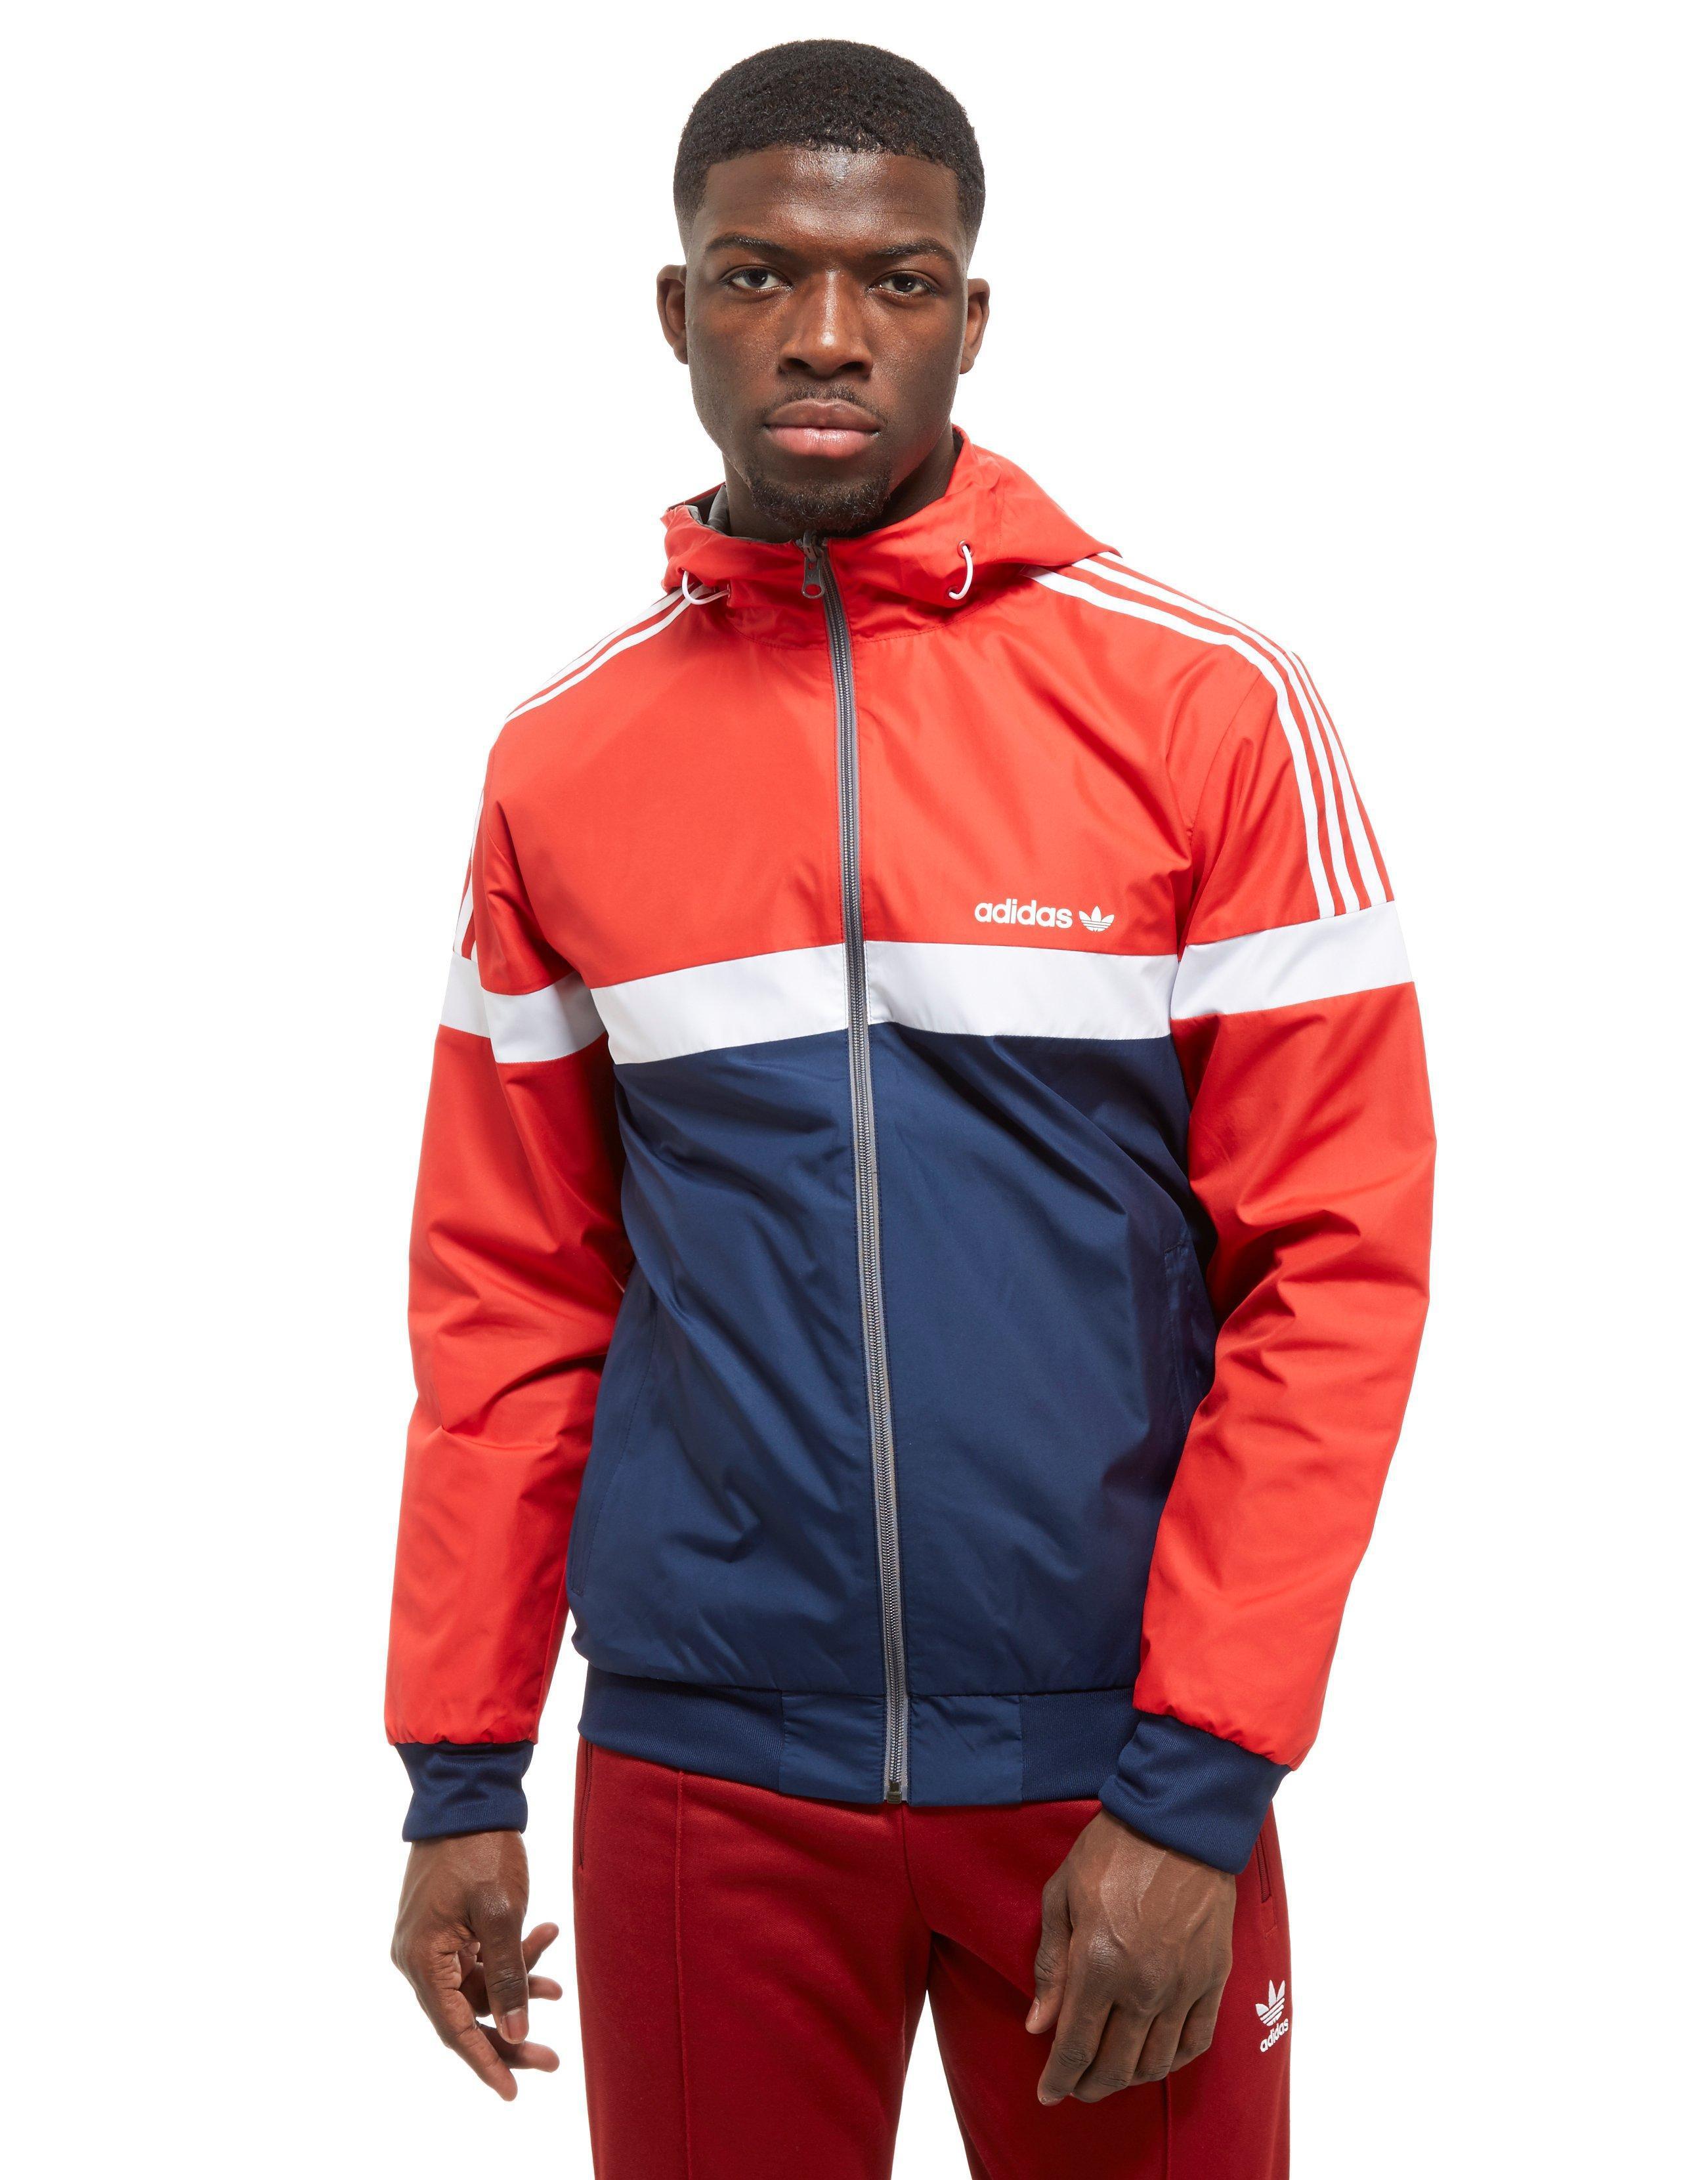 5c35f16f26a9 adidas Originals Itaska Reversible Jacket in Red for Men - Lyst